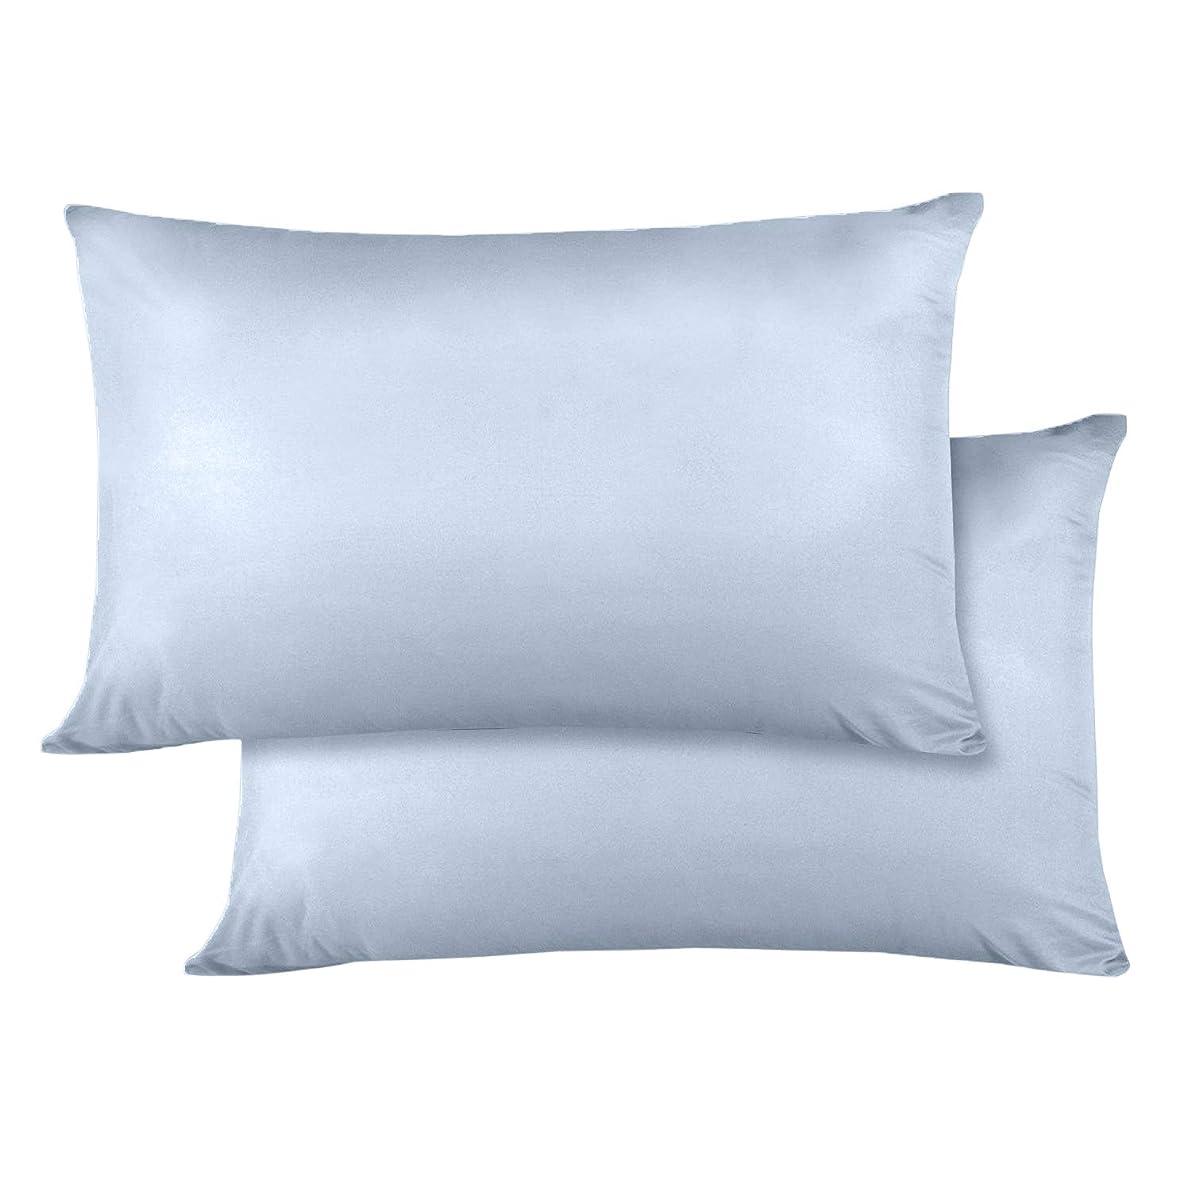 Jersey Knit Super Soft Pillow Cases, PolyCotton, Enevelope Closure End, Standard Size (20